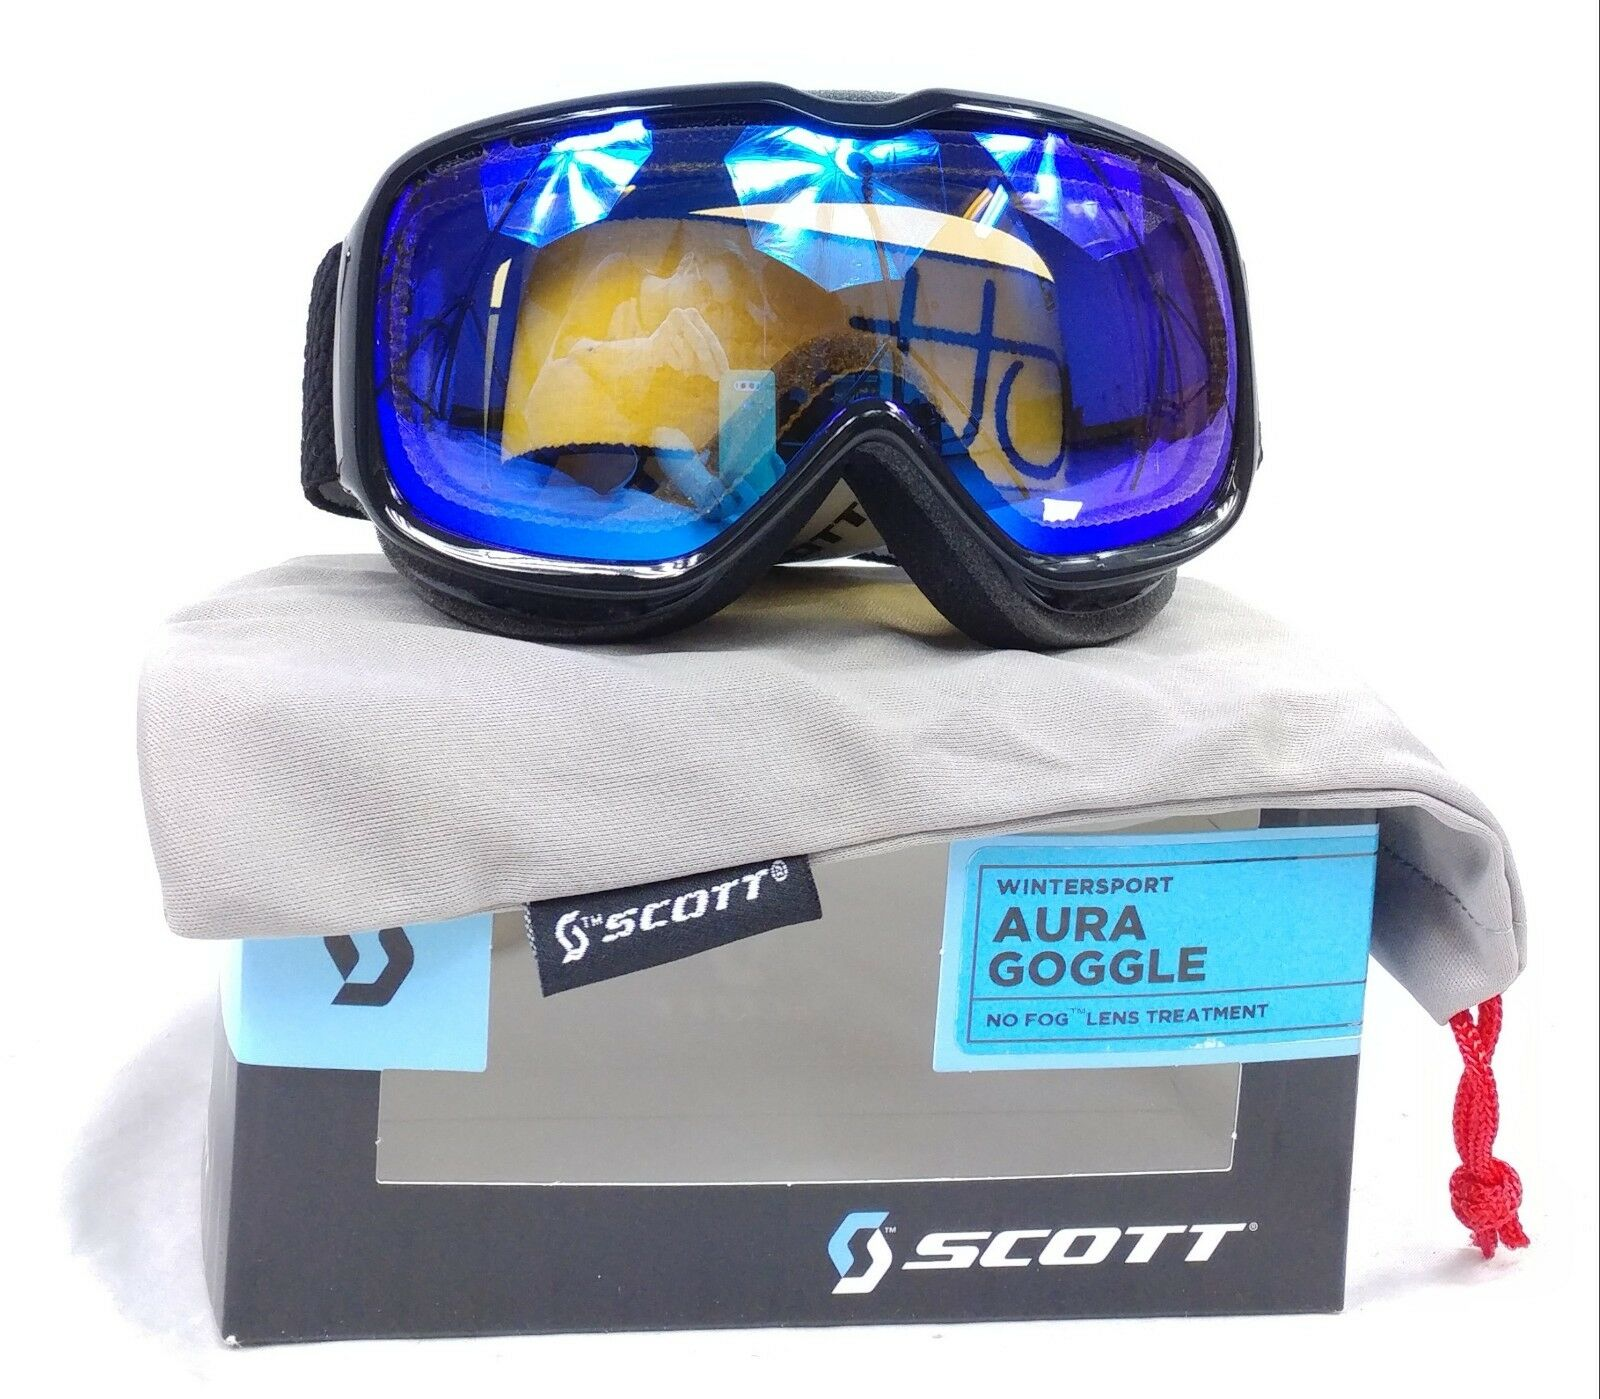 SKI GOGGLES, SNOWBOARD GOGGLES, Scott Aura Women's Ski Snowboard Goggle, BUBBLE